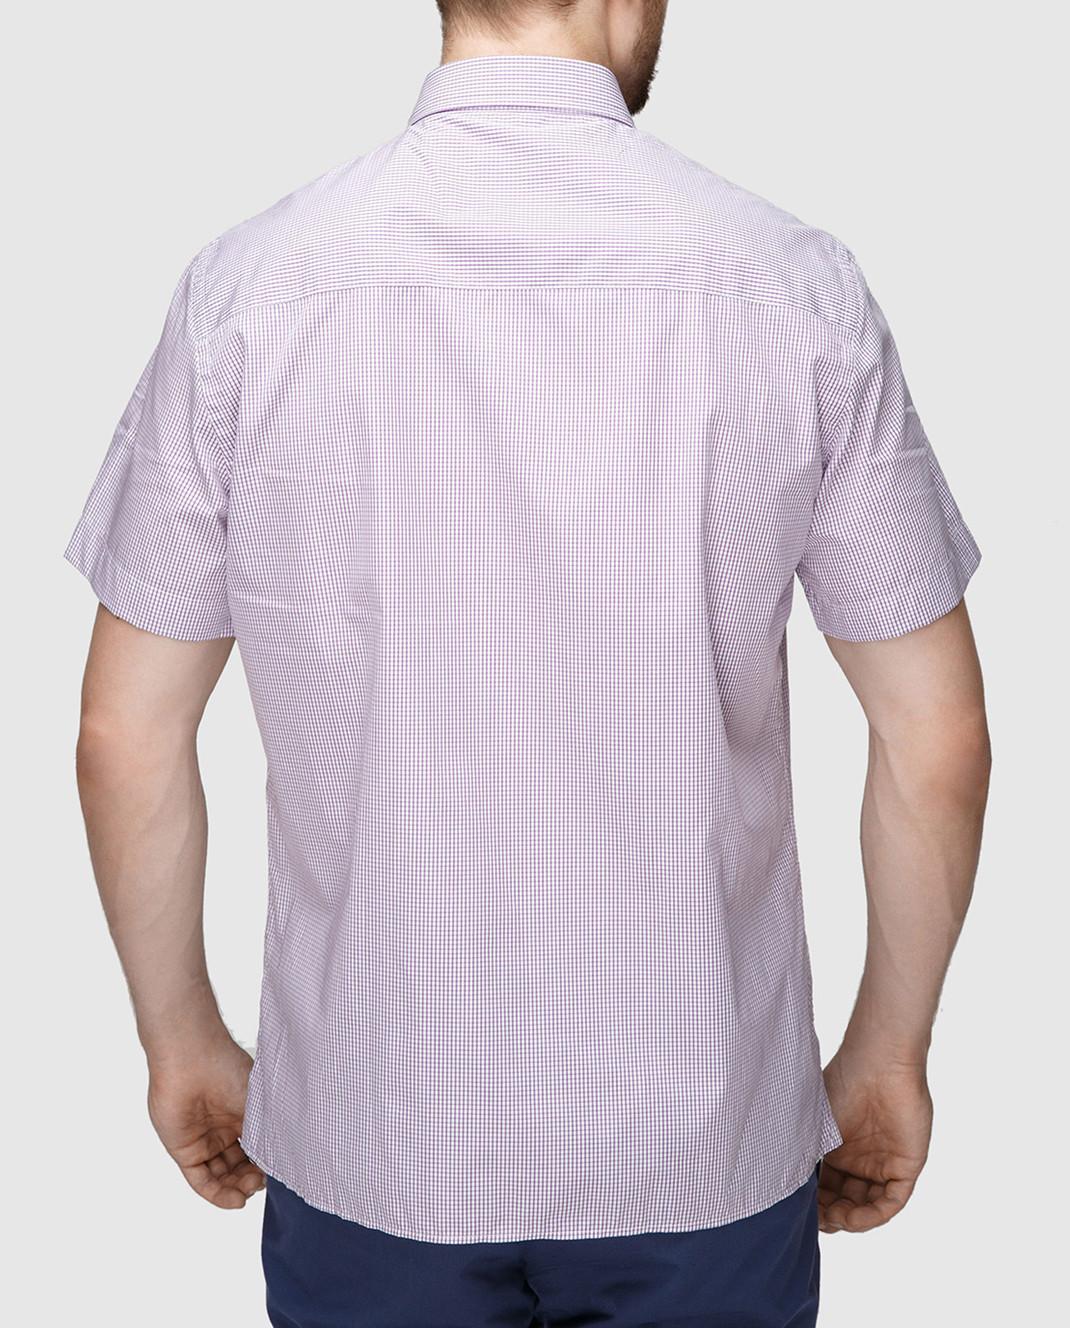 Luciano Barbera Сиреневая рубашка R10559071230 изображение 4